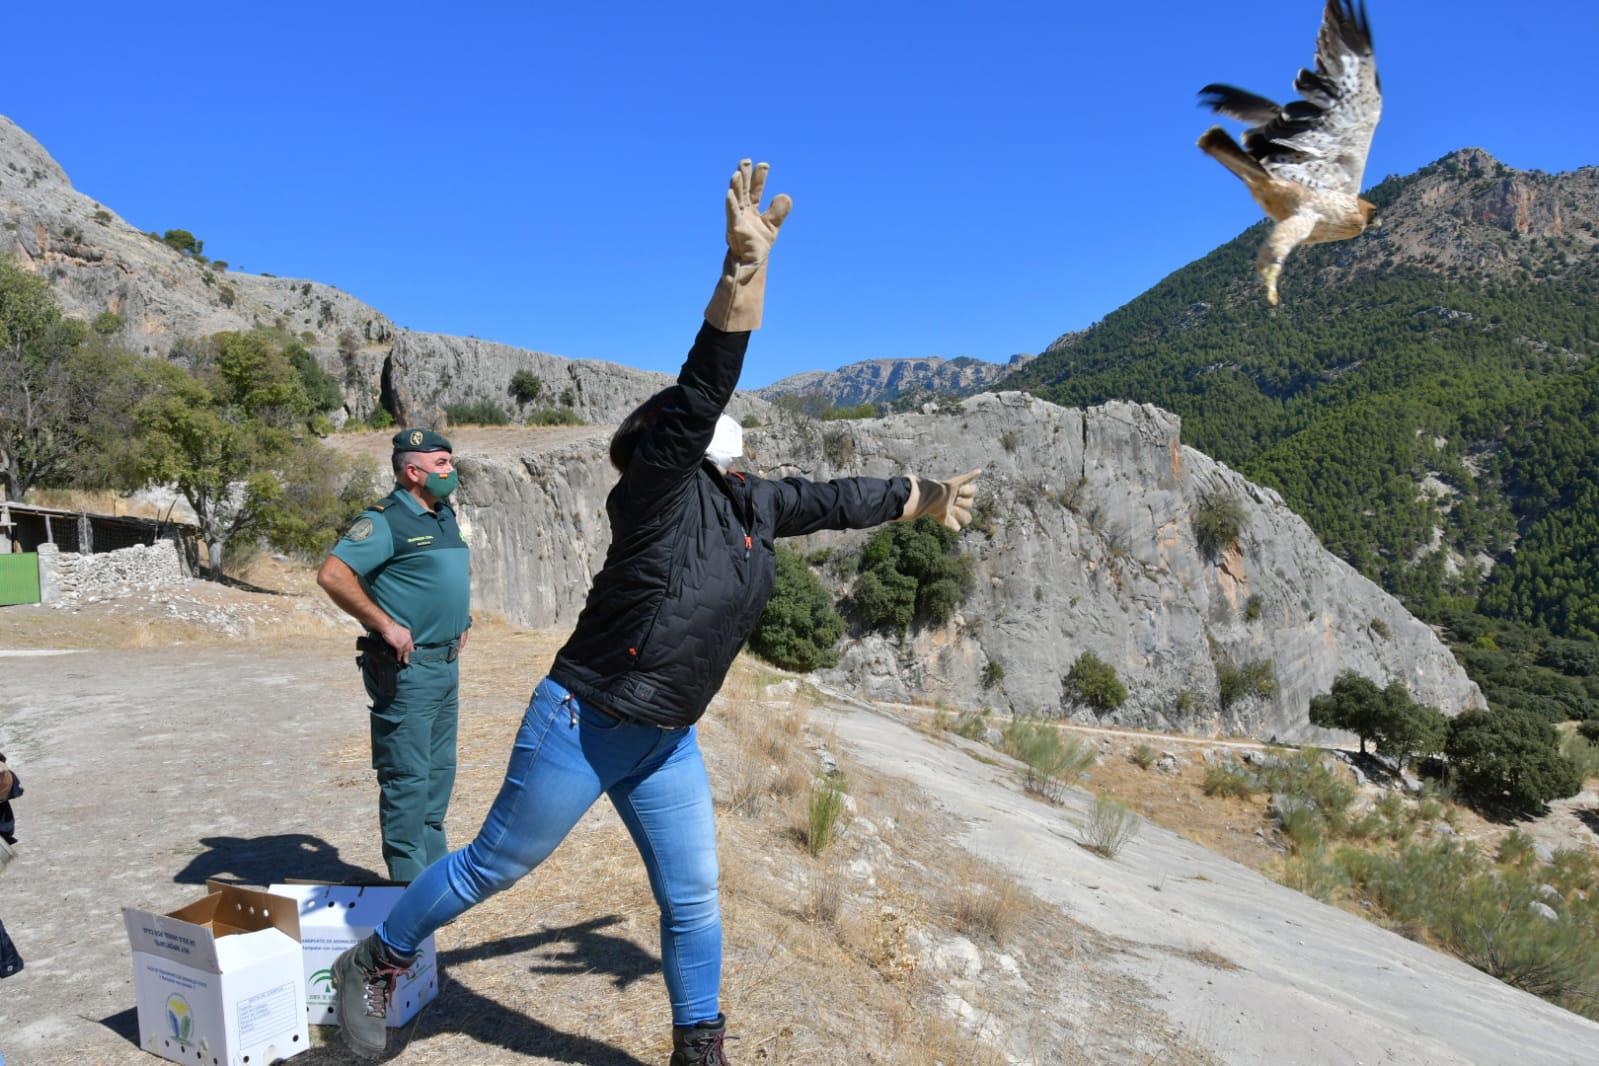 Liberan en la sierra de Castril dos ejemplares de águila calzada